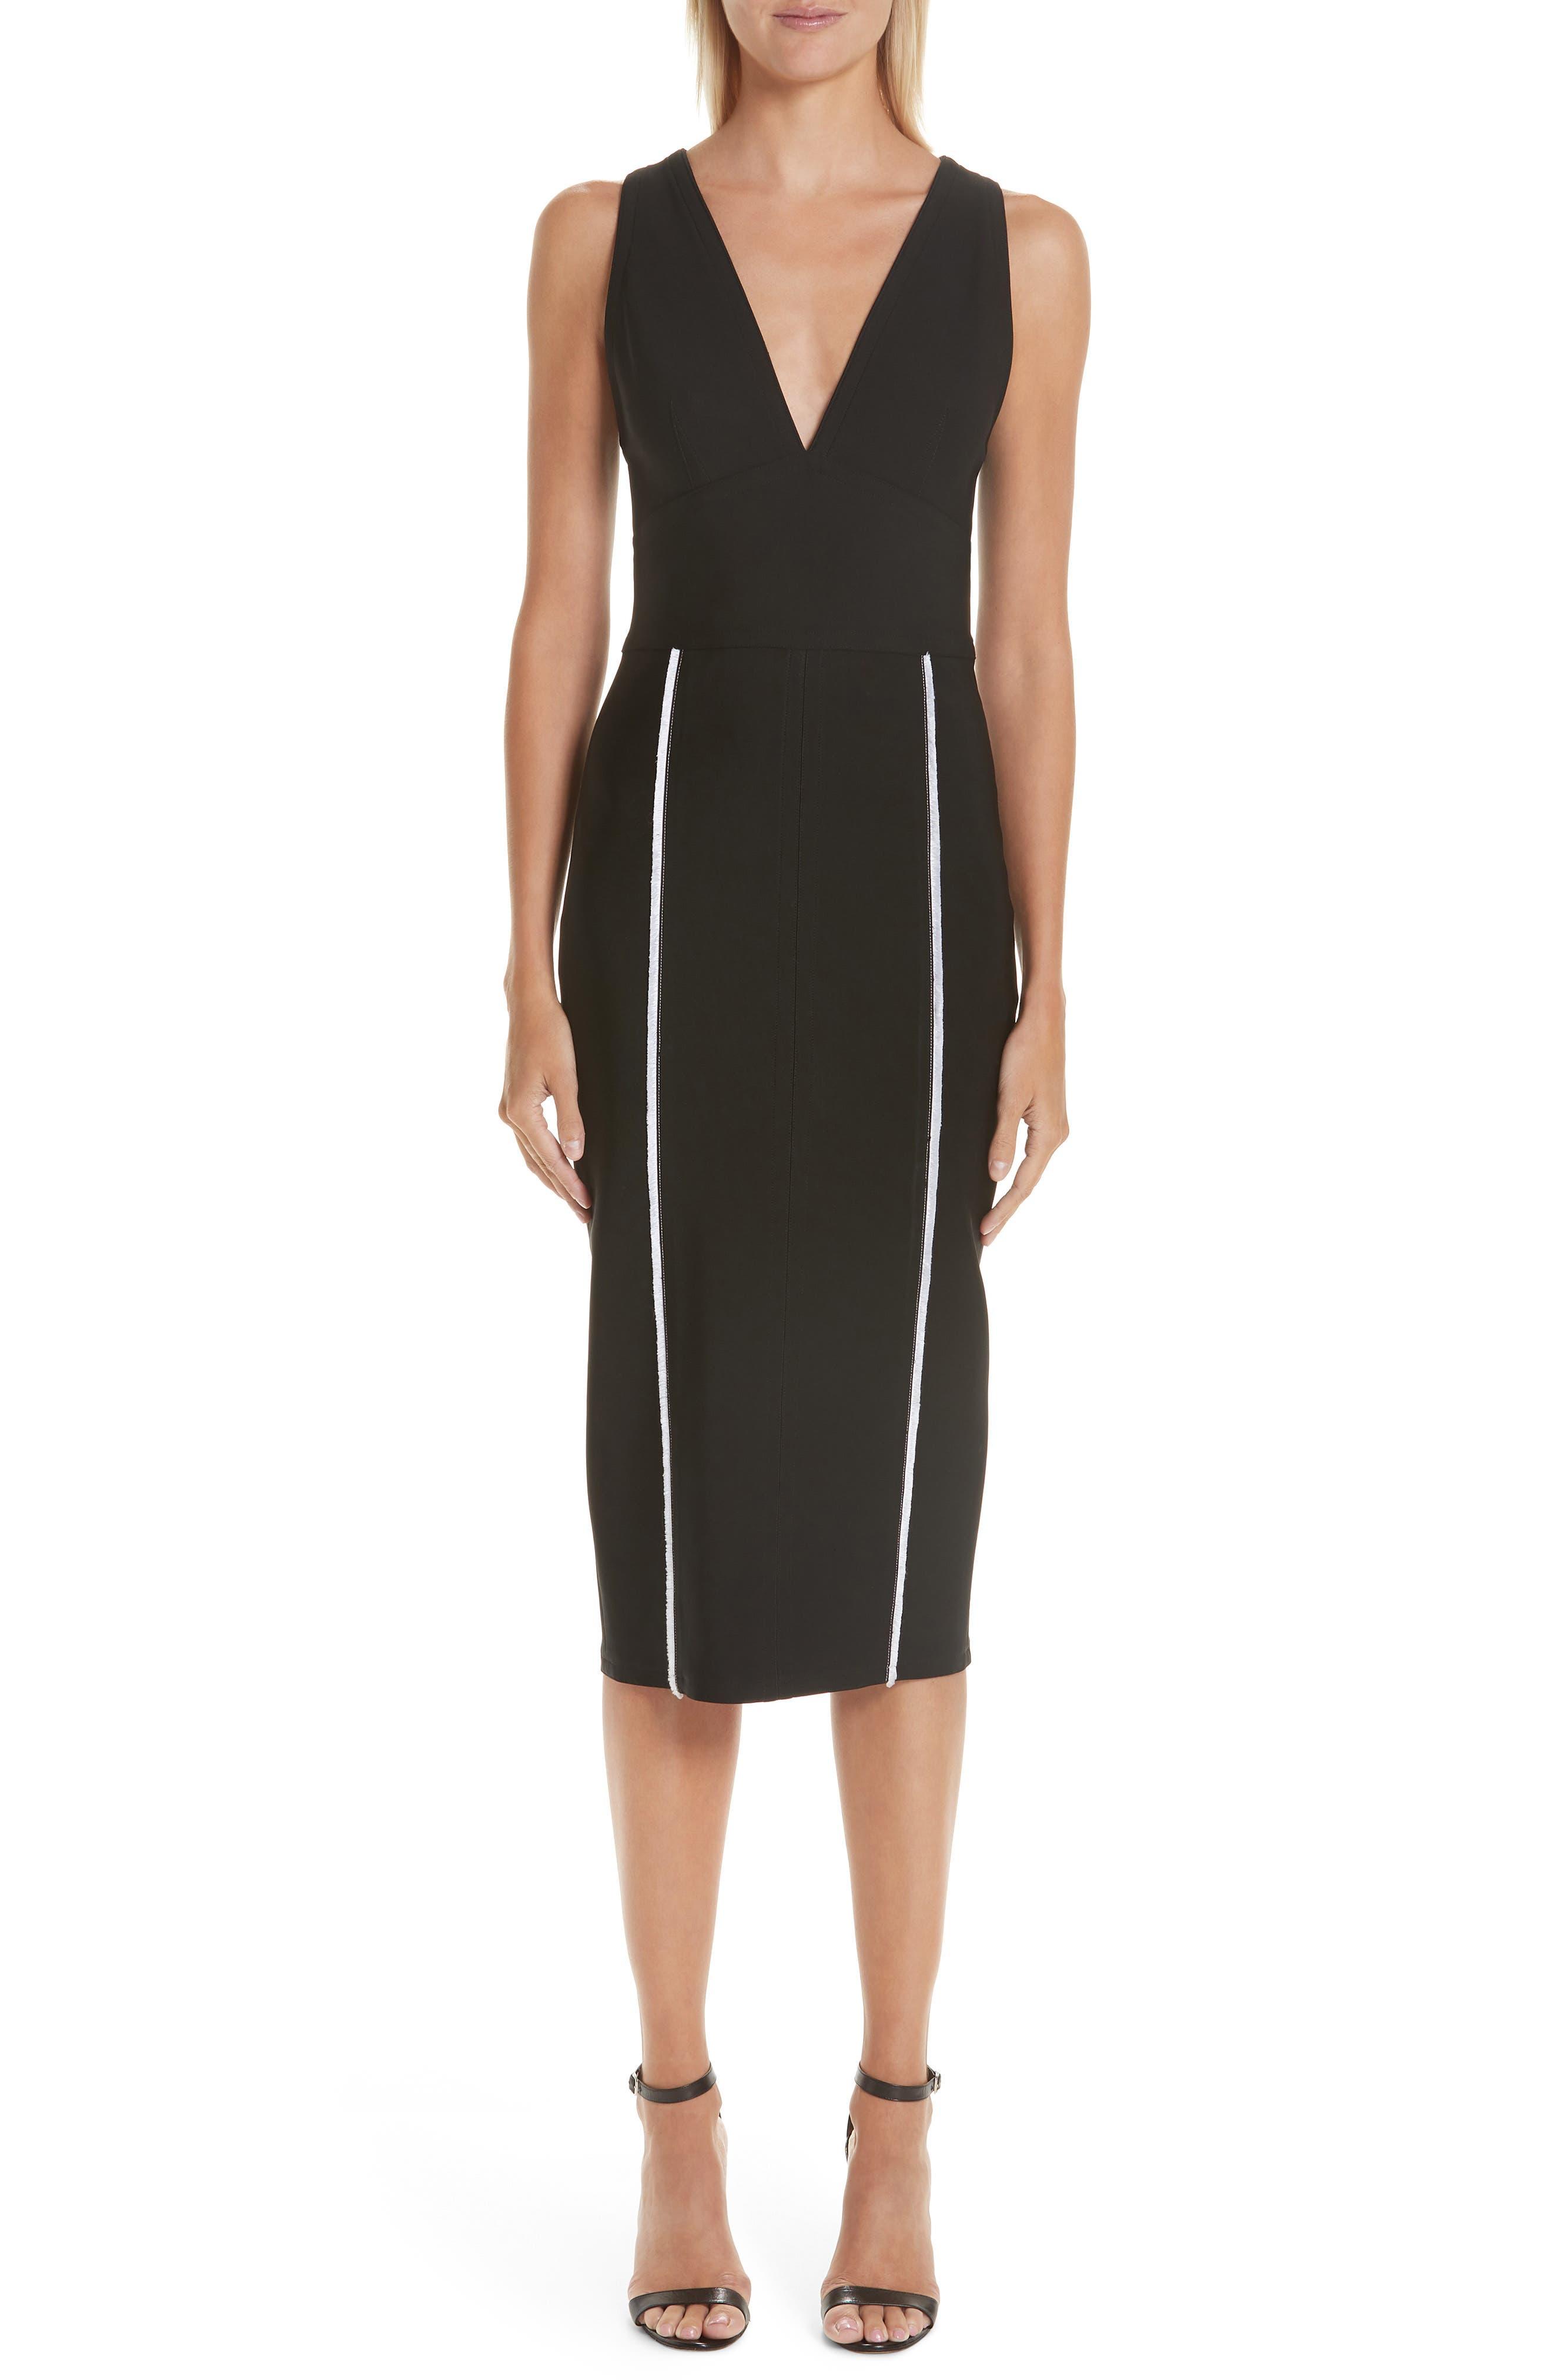 Yigal Azrouel Contrast Trim Body-Con Dress, Black